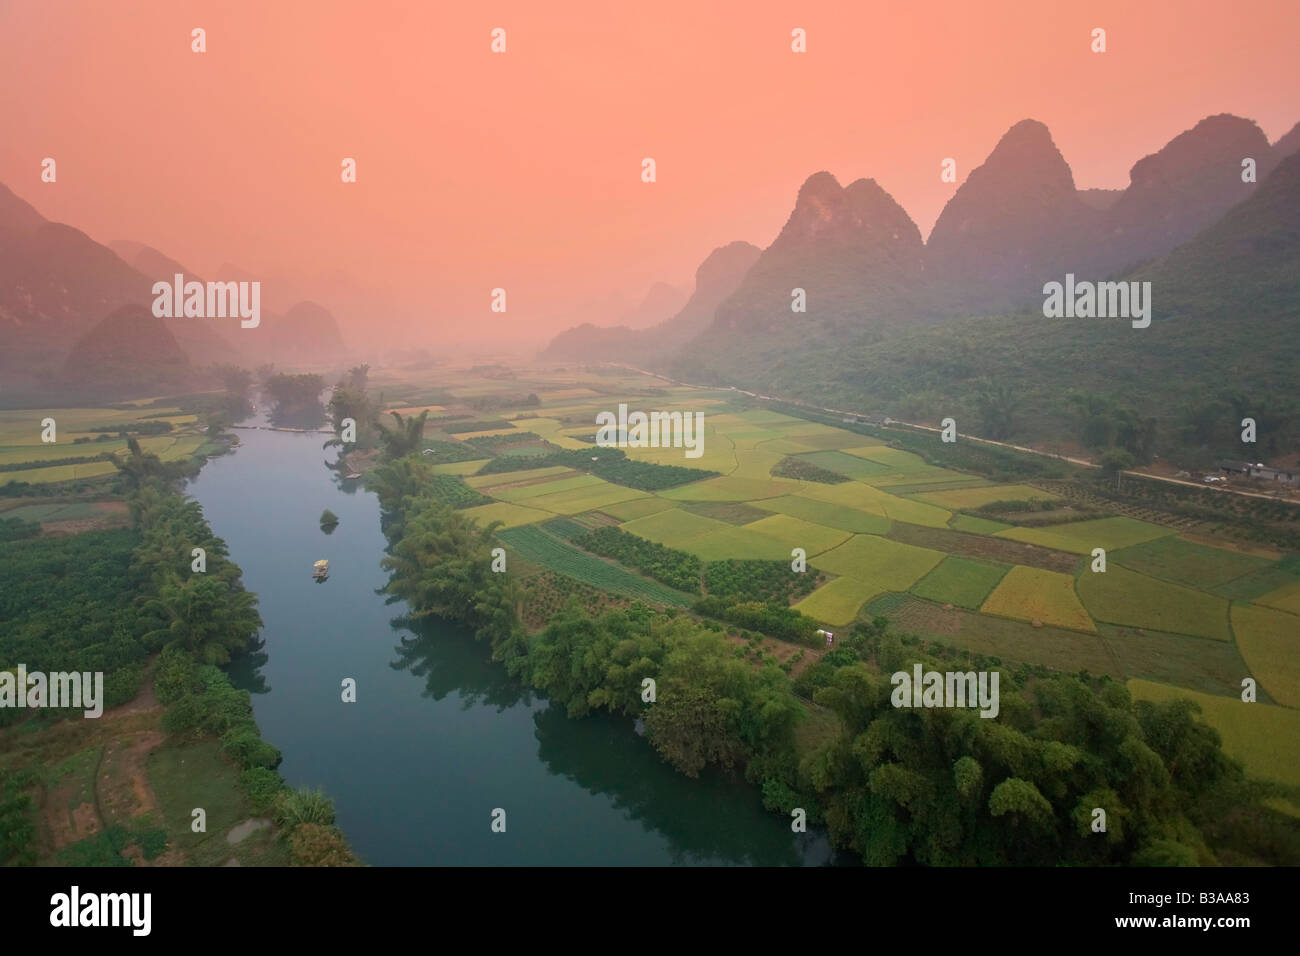 Karst-Berg-Landschaft & Li-Fluss von Heißluftballon, Yangshuo, Guilin, Provinz Guangxi, China Stockbild